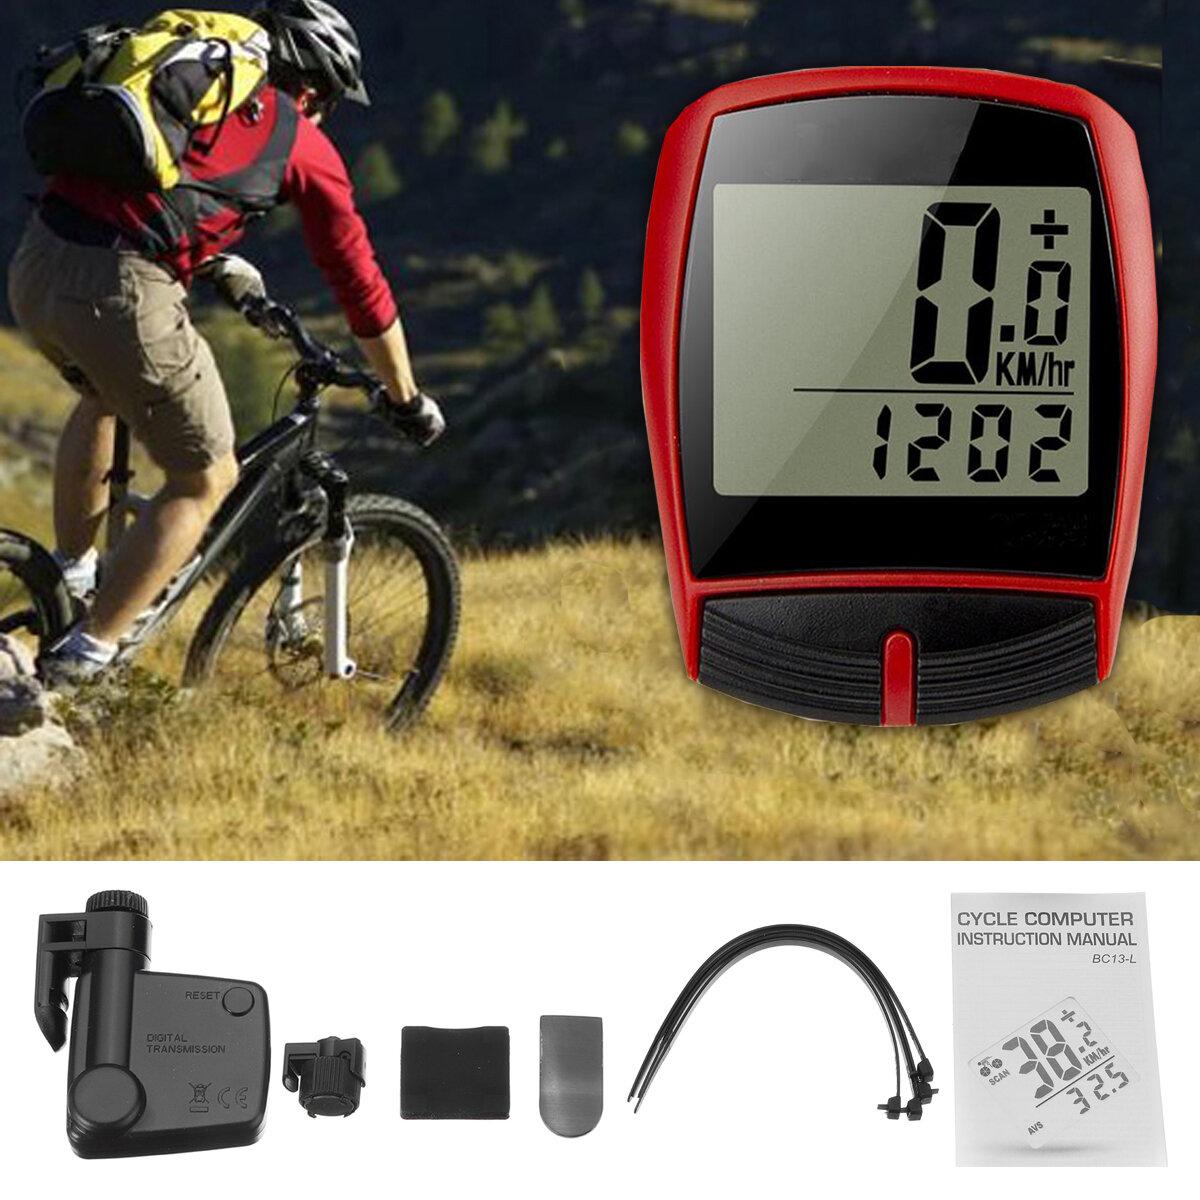 BIKIGHT Wireless LCD Cycling Bike Ciclo de bicicleta Cuentakilómetros Velocímetro Impermeable Luz trasera